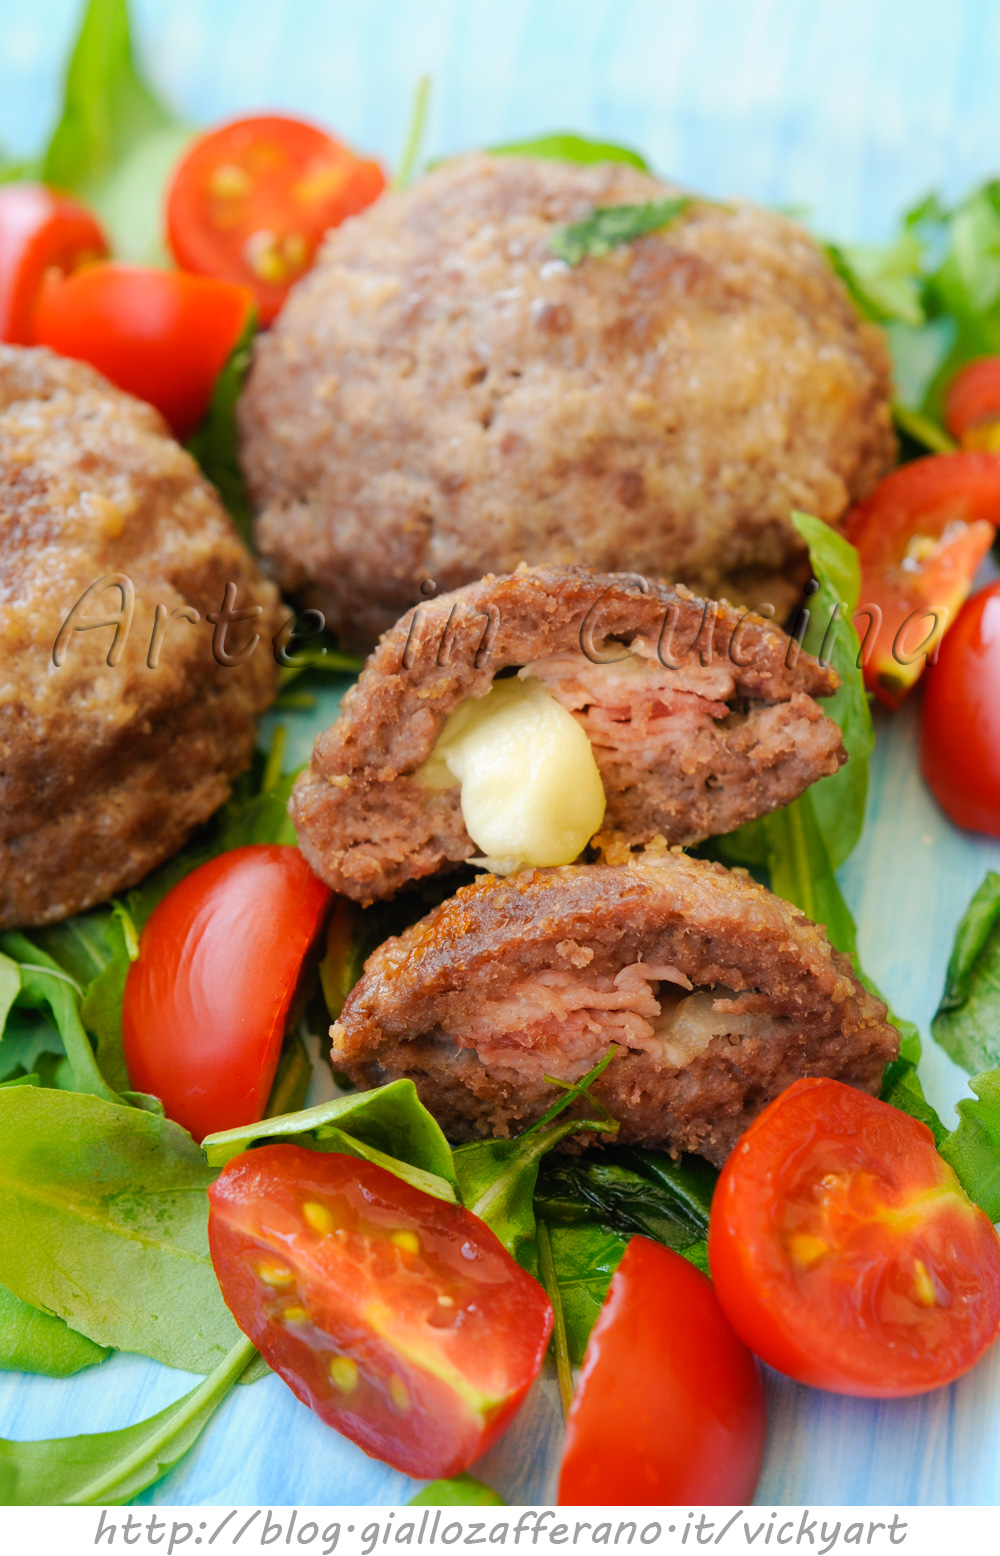 Bombe di carne ripiene ricetta sfiziosa veloce vickyart arte in cucina